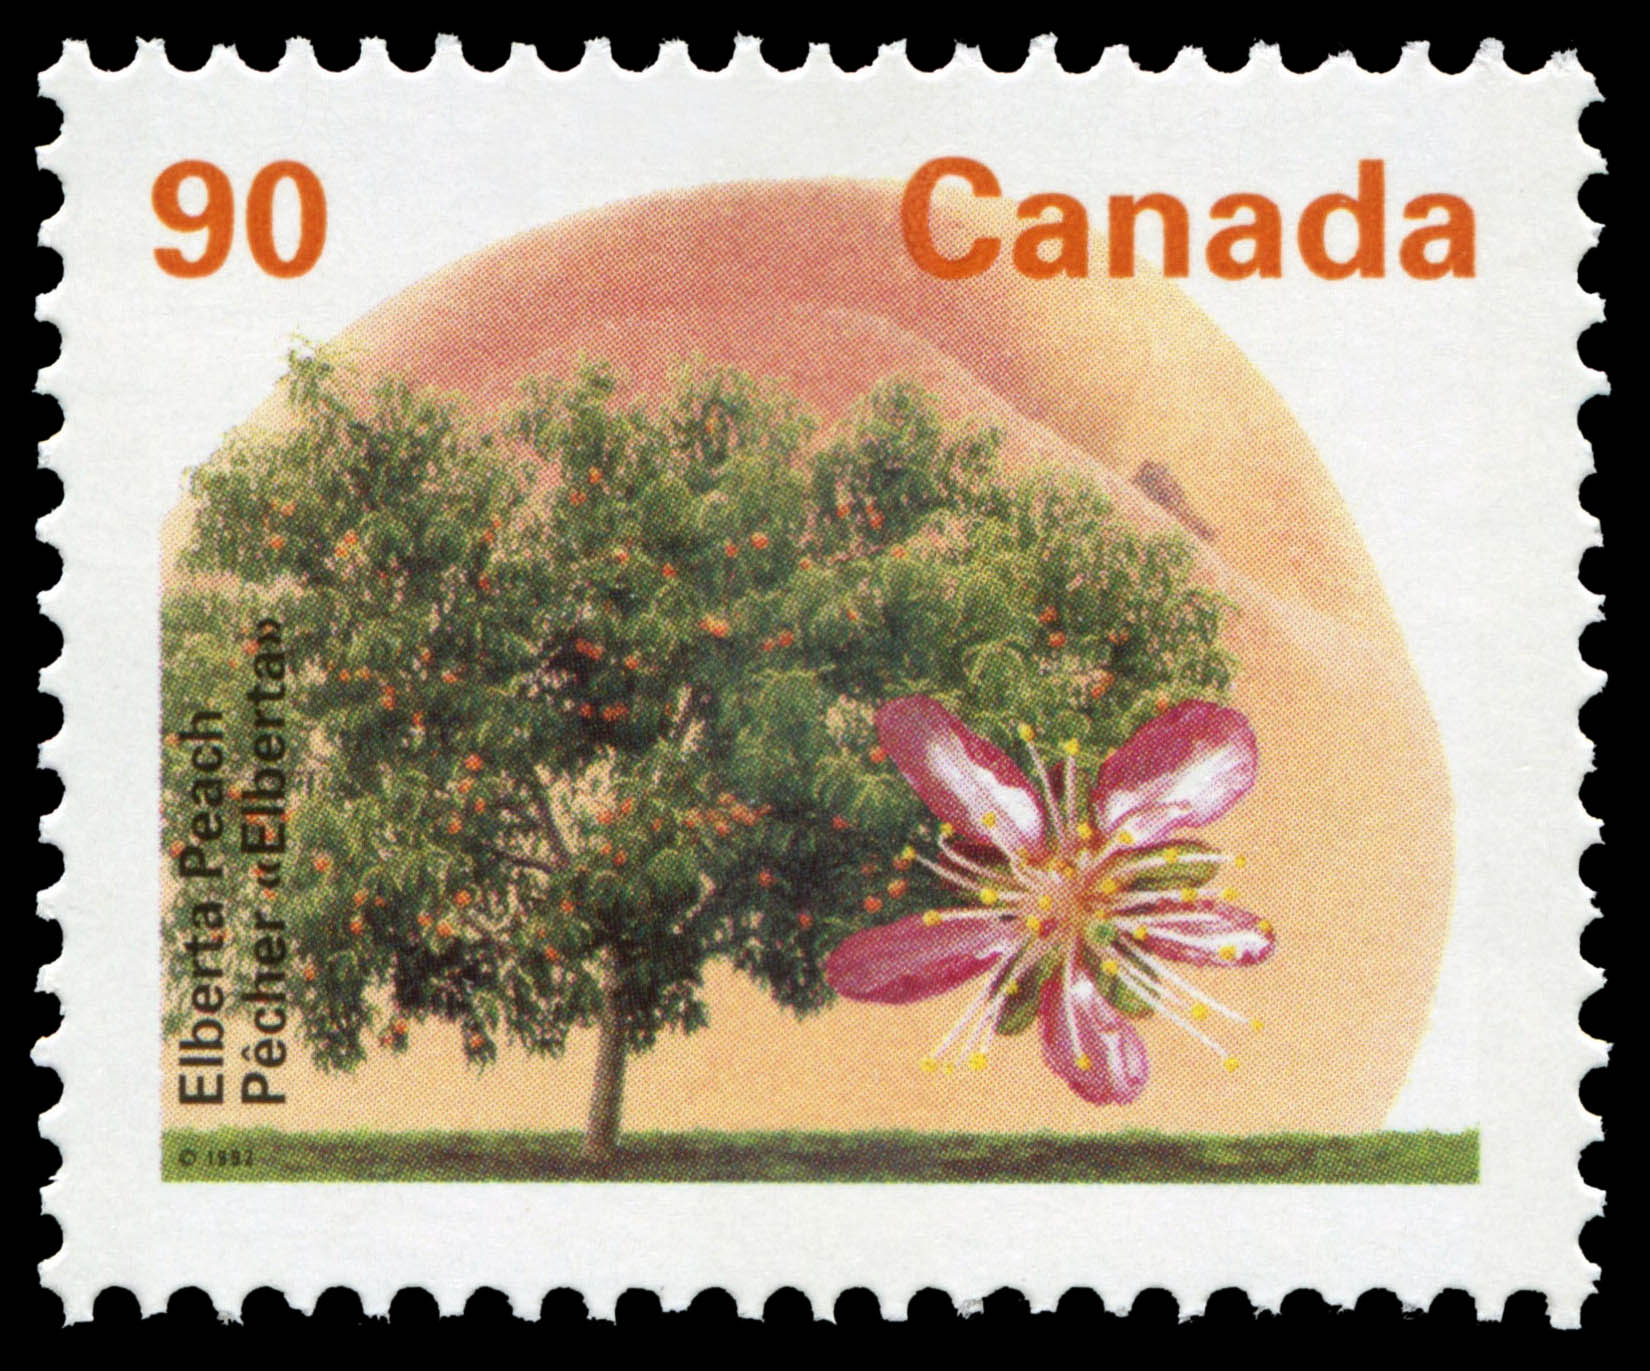 Elberta Peach Canada Postage Stamp